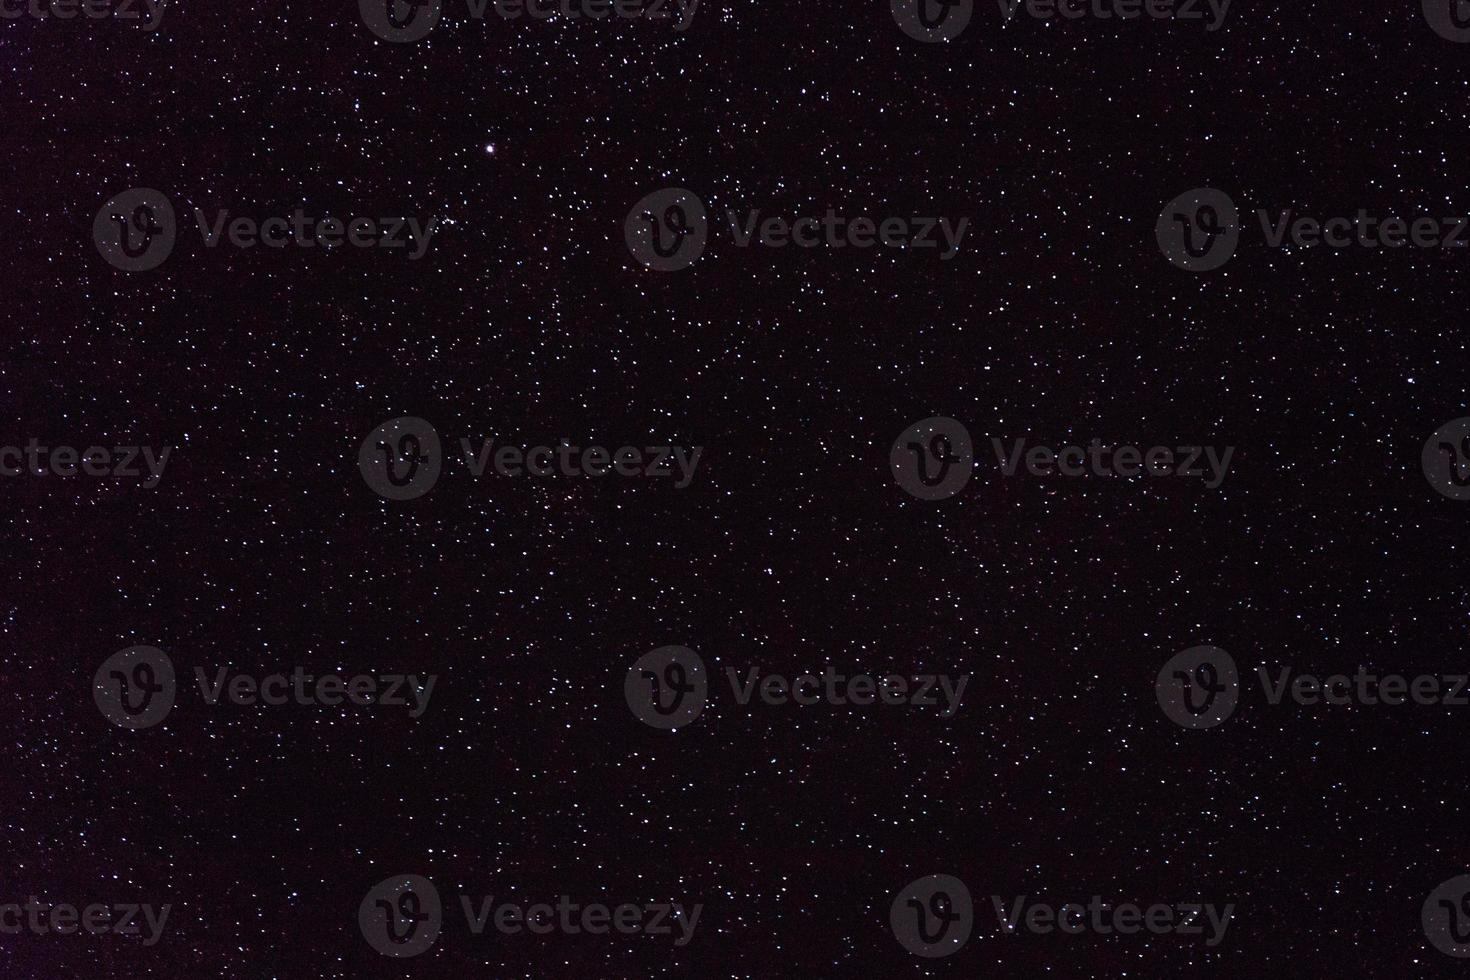 Cygnus amplio campo foto